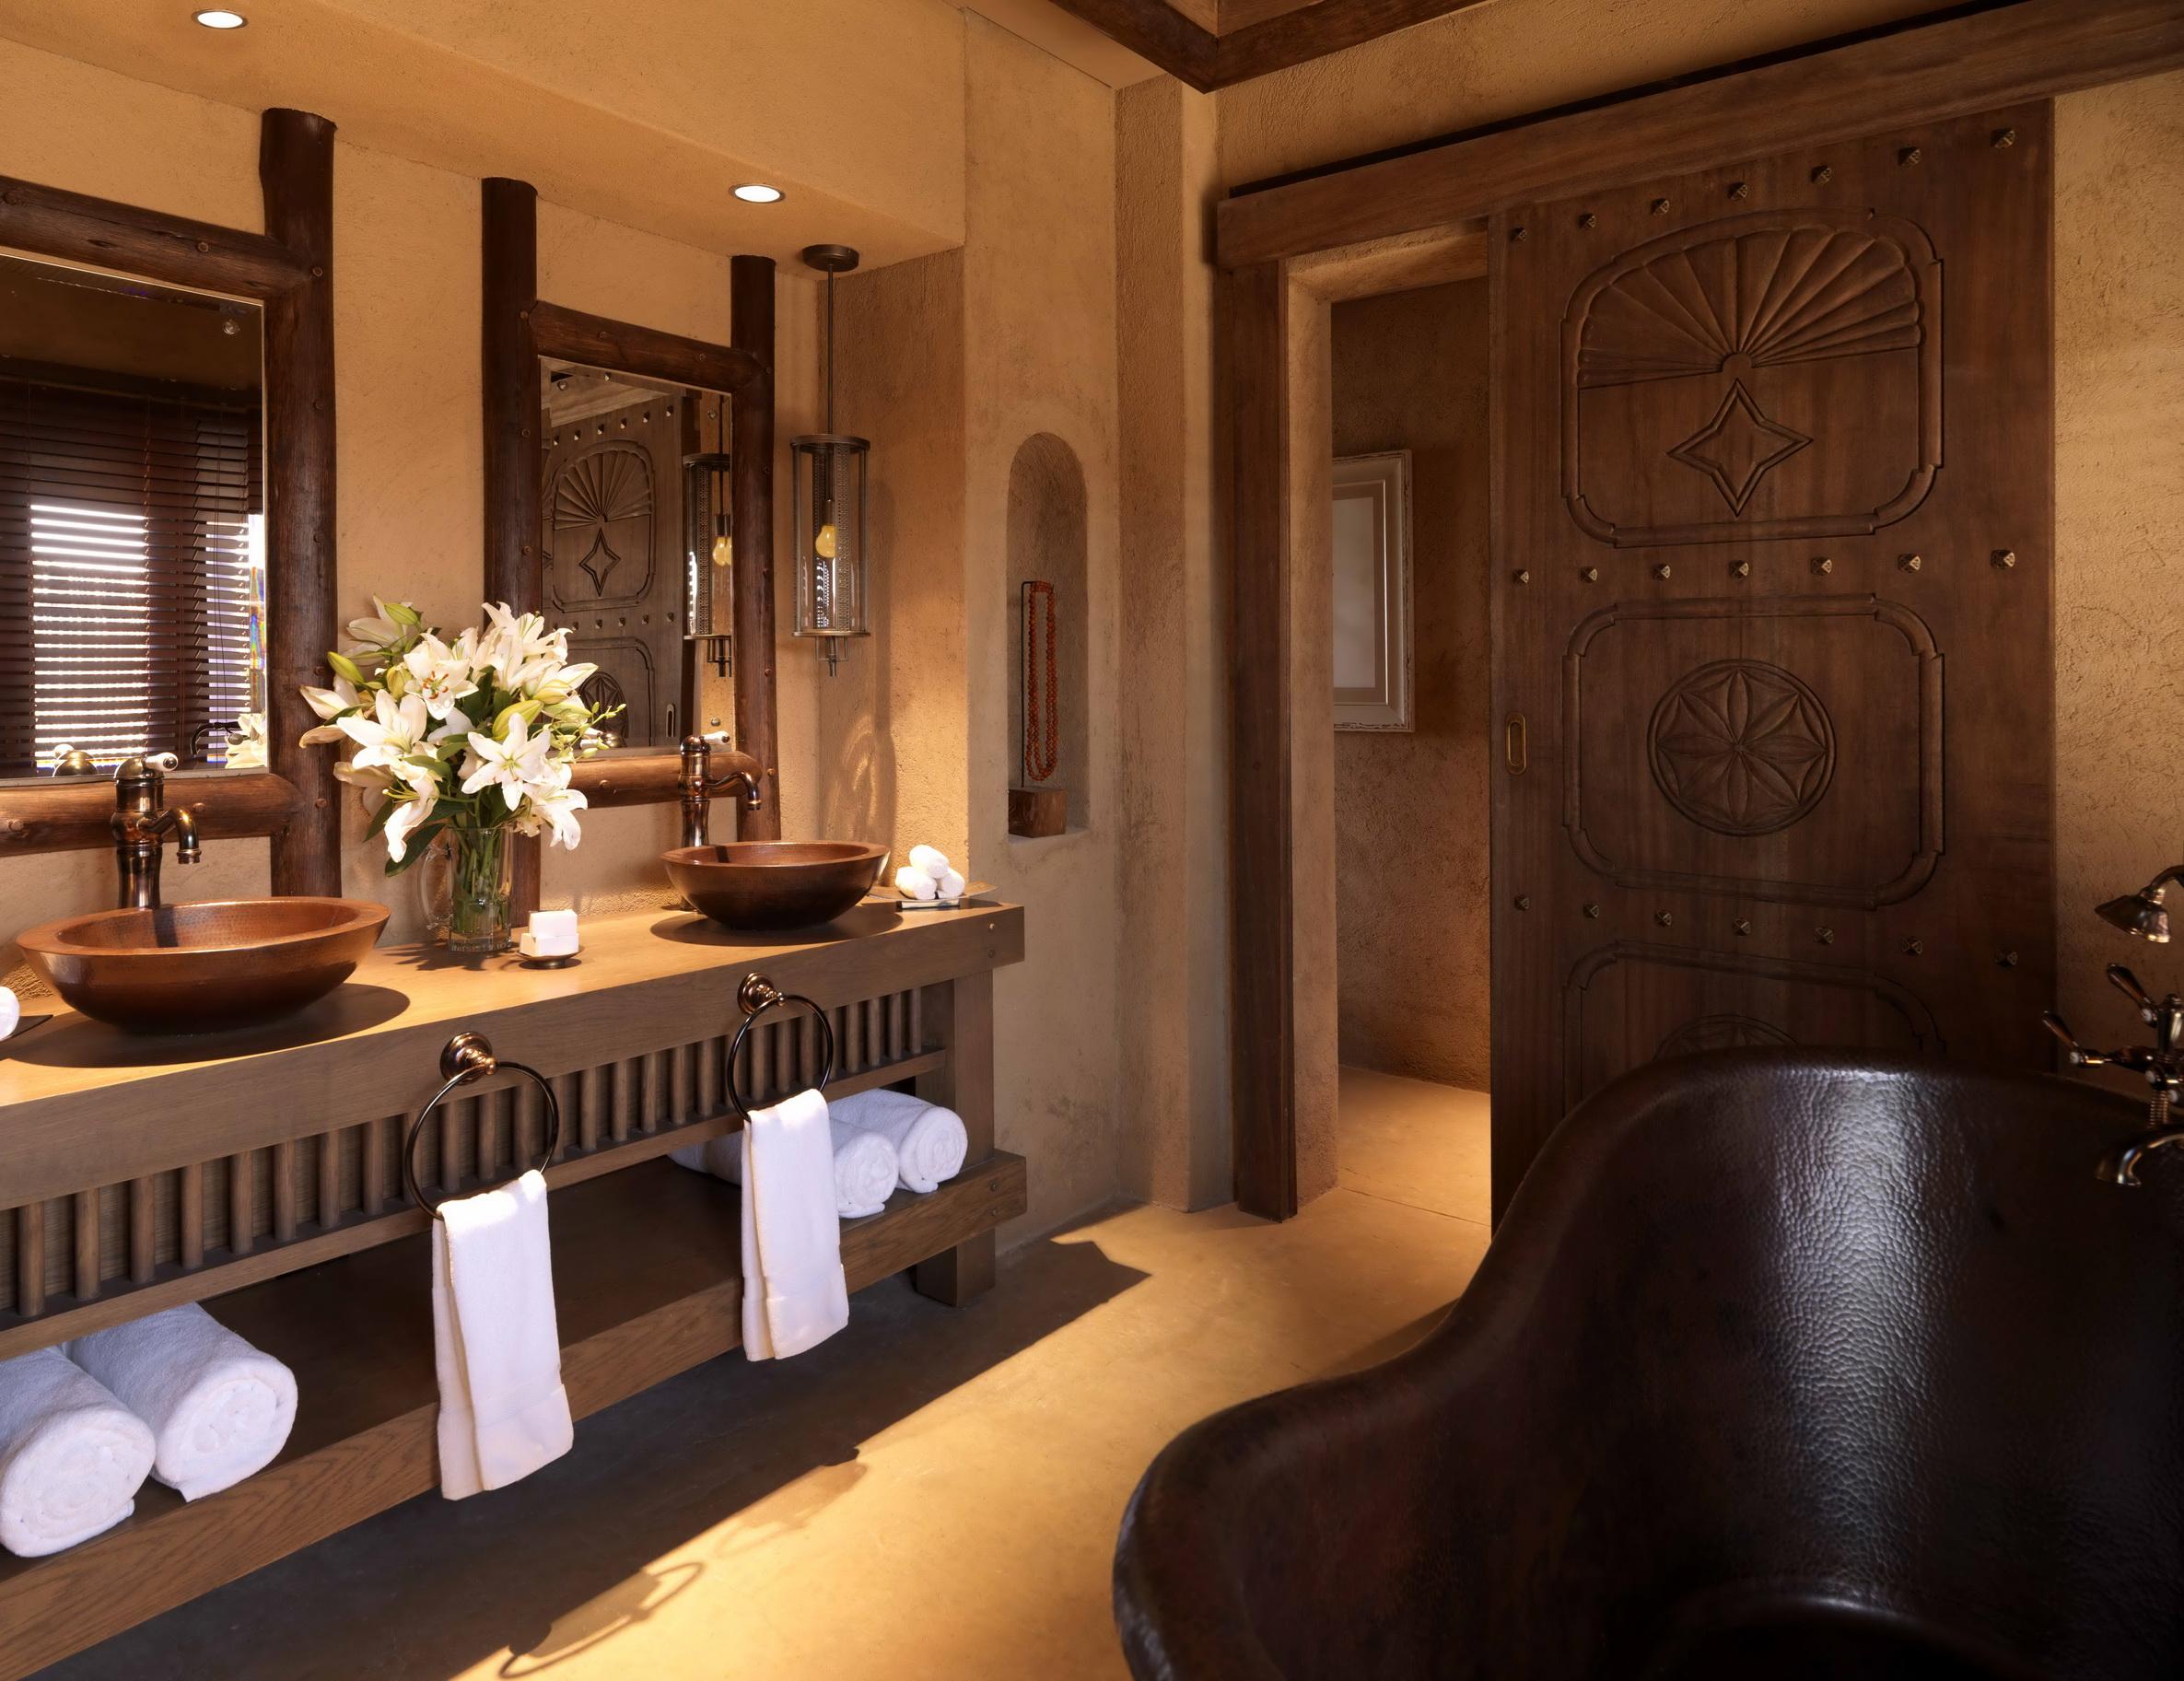 53717590-H1-Bathroom.jpg